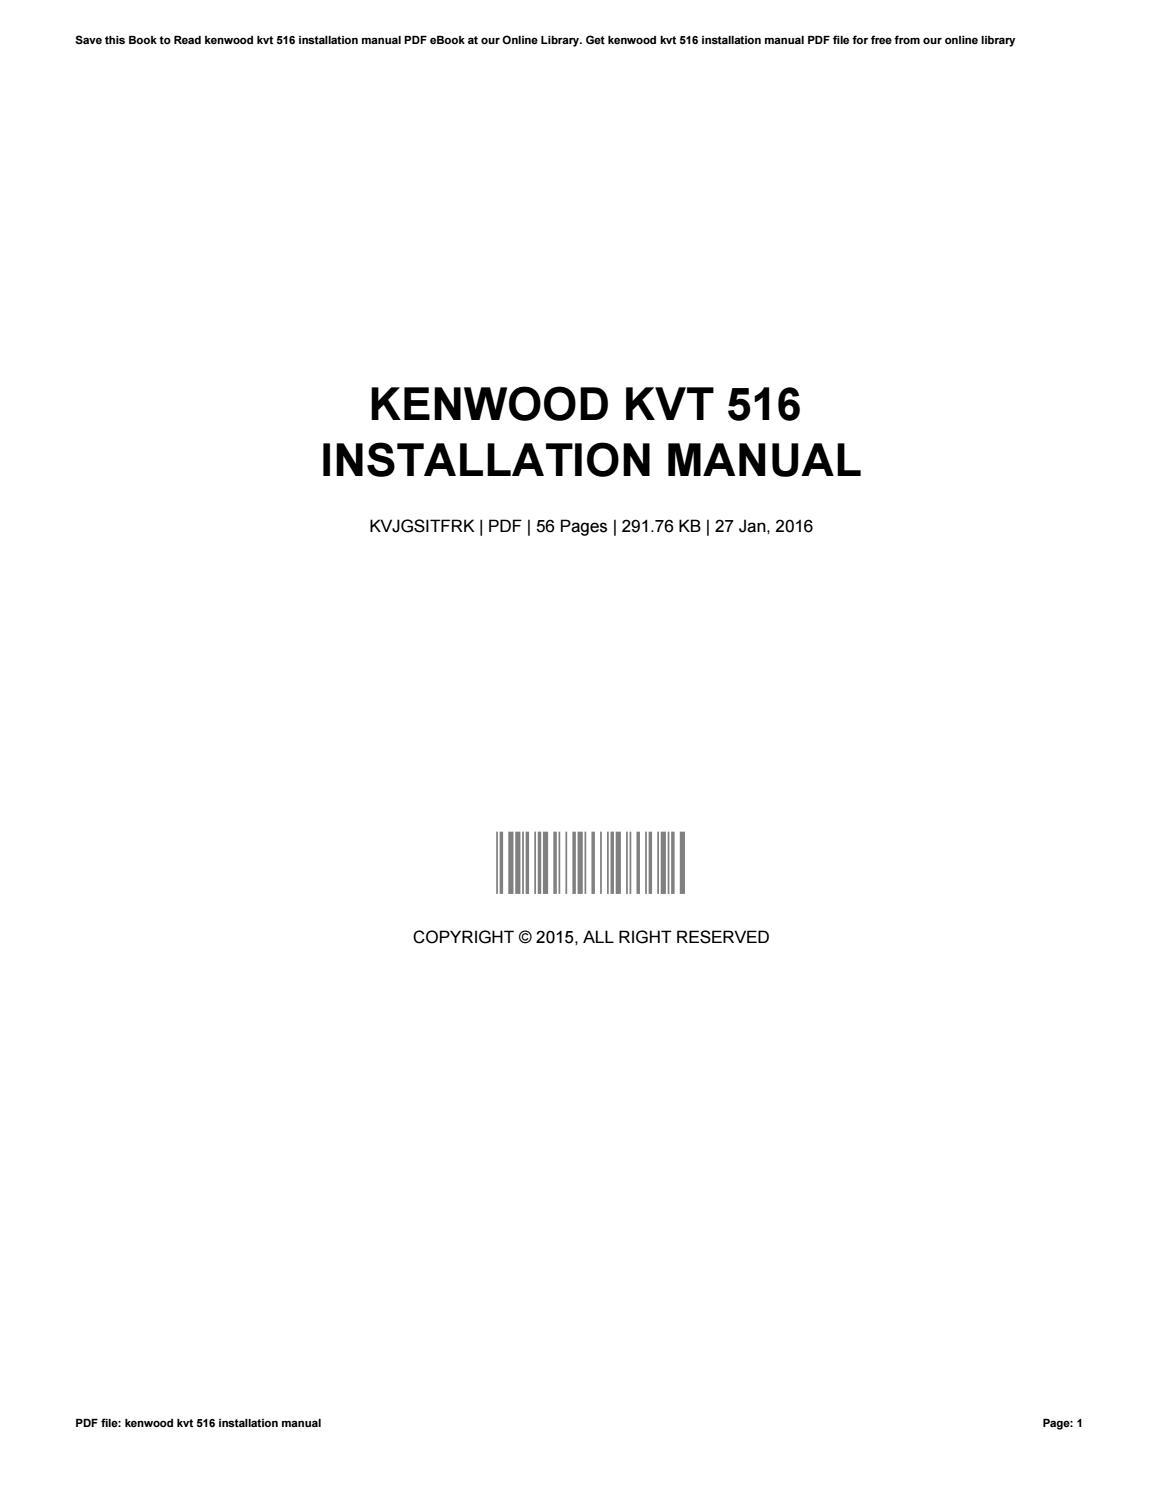 kenwood kvt 516 owners manual